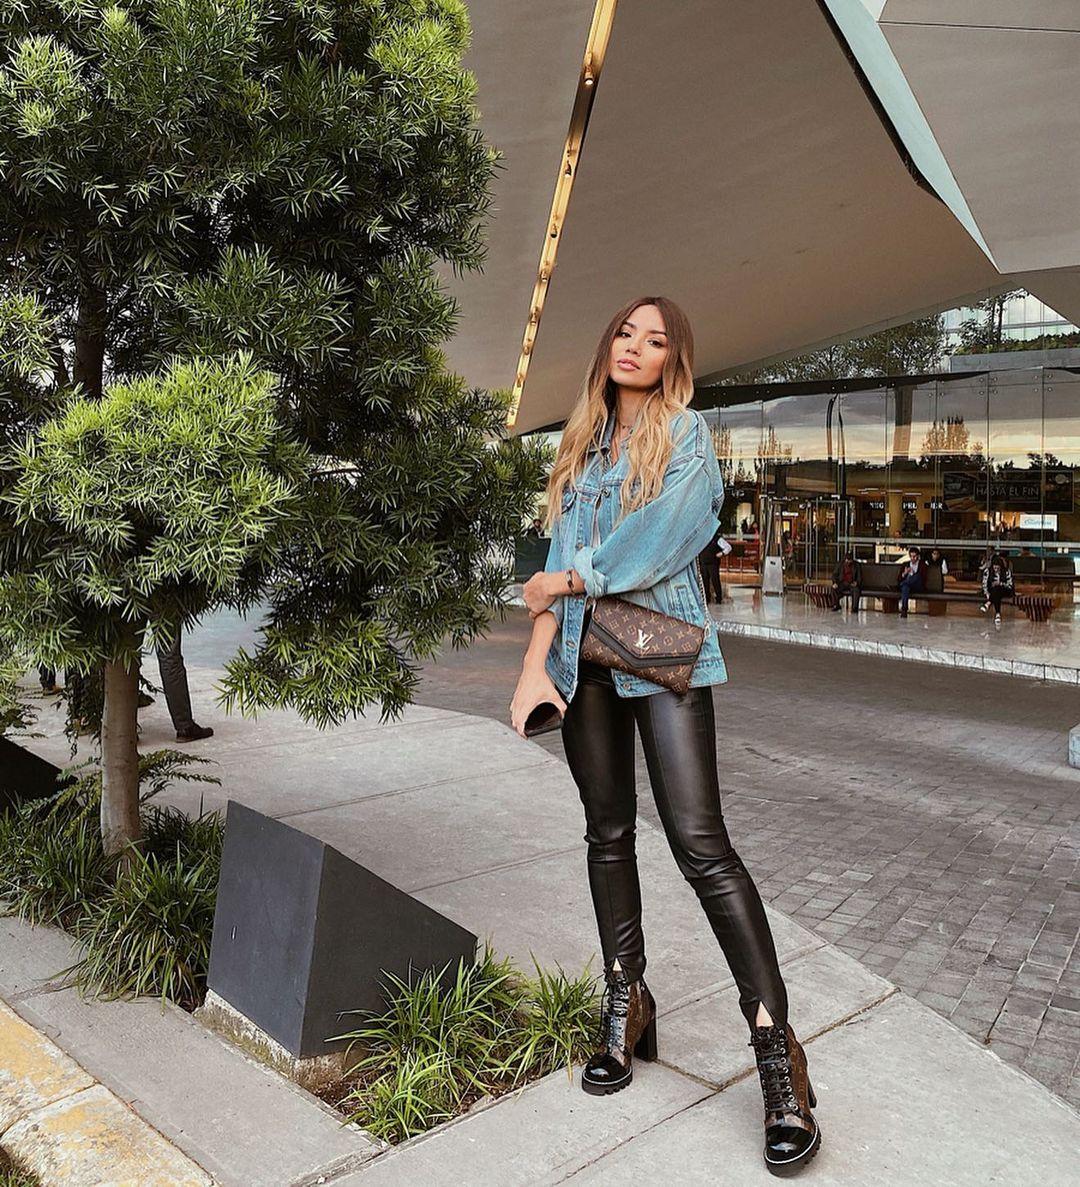 Selfcare, la línea de belleza de Mónica Murillo